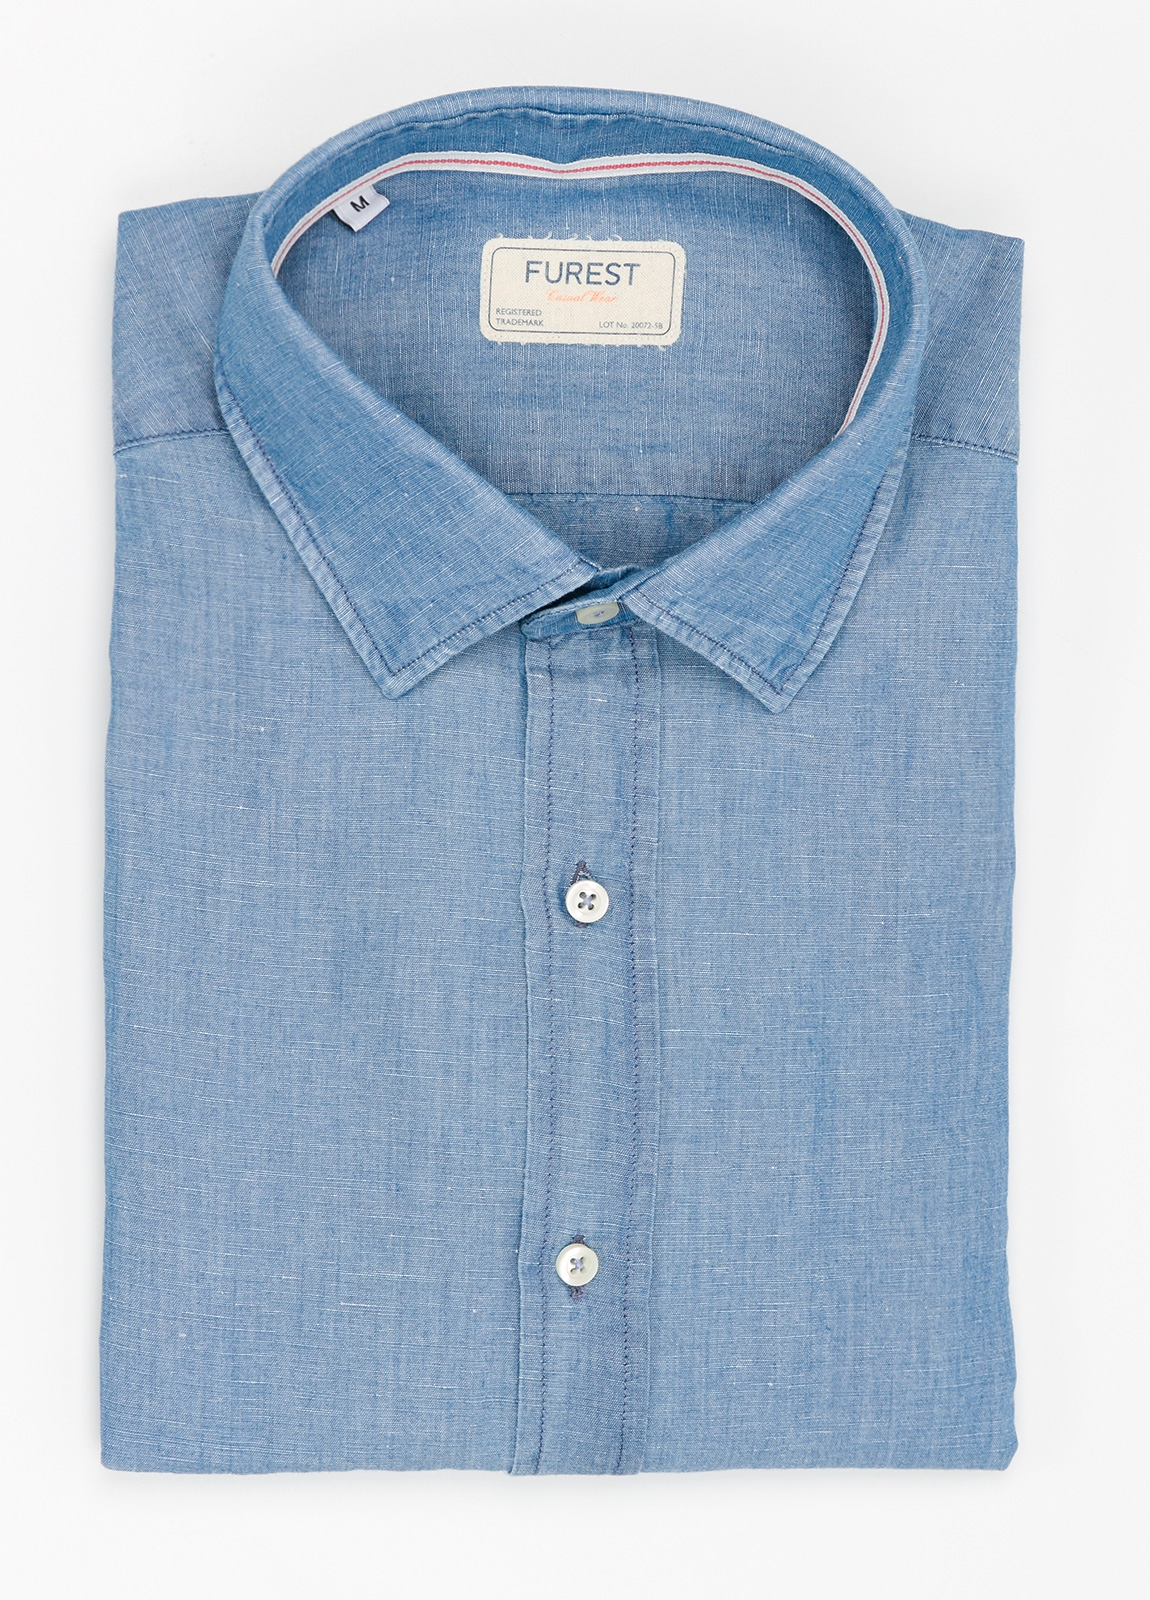 Camisa Casual Wear SLIM FIT Modelo PORTO color azul denim. 100% Algodón.